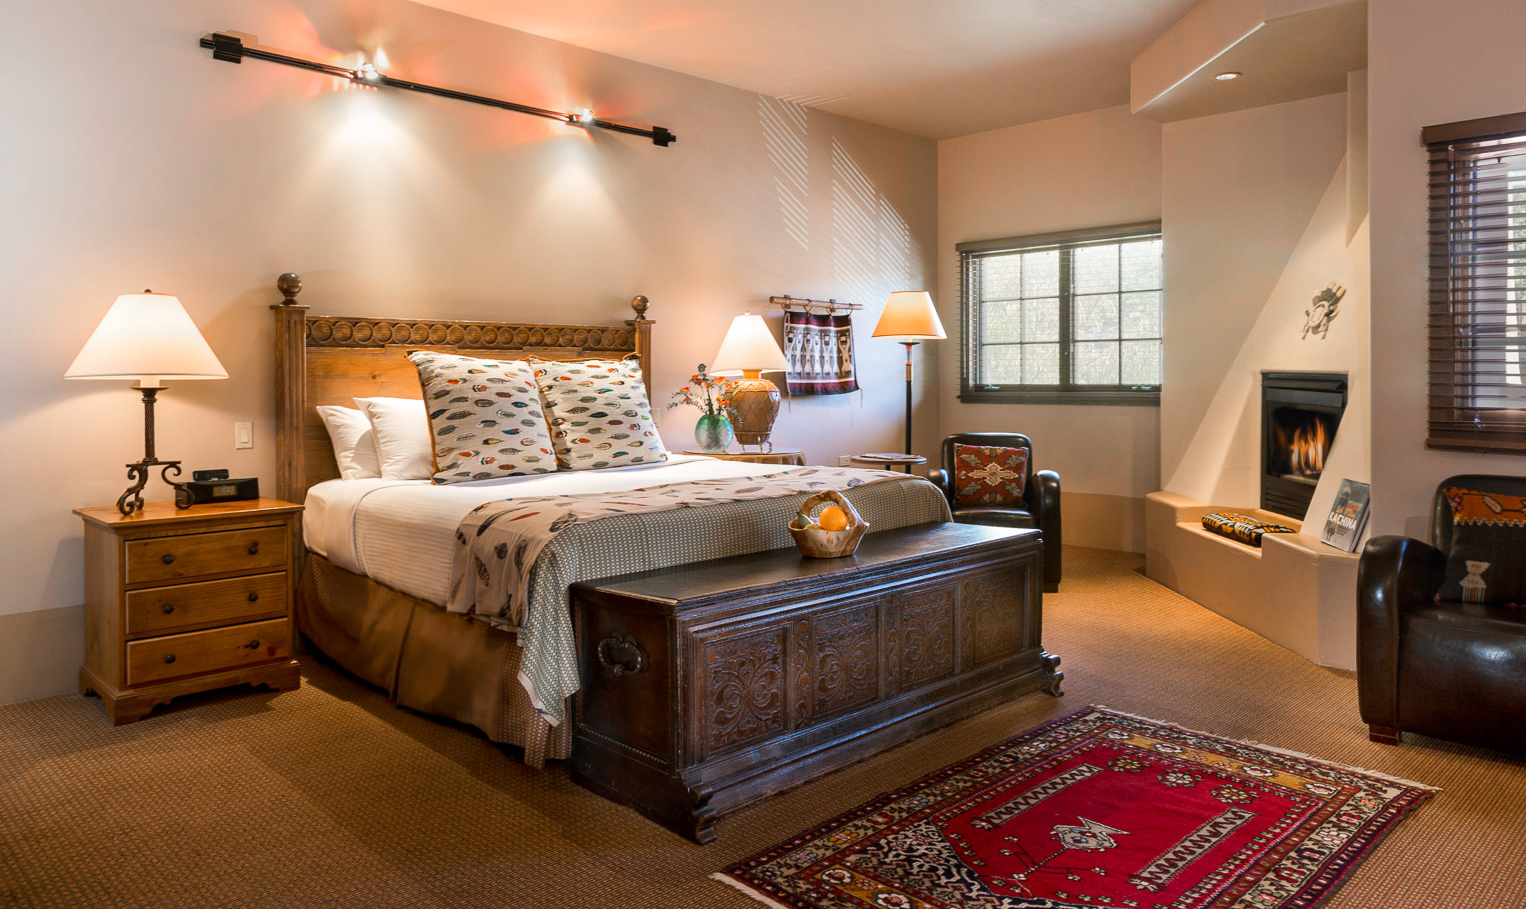 HSF-Rooms-Room520-Bedroom-01b-58ee9c6d44478.jpg?mtime=20180314093052#asset:100904